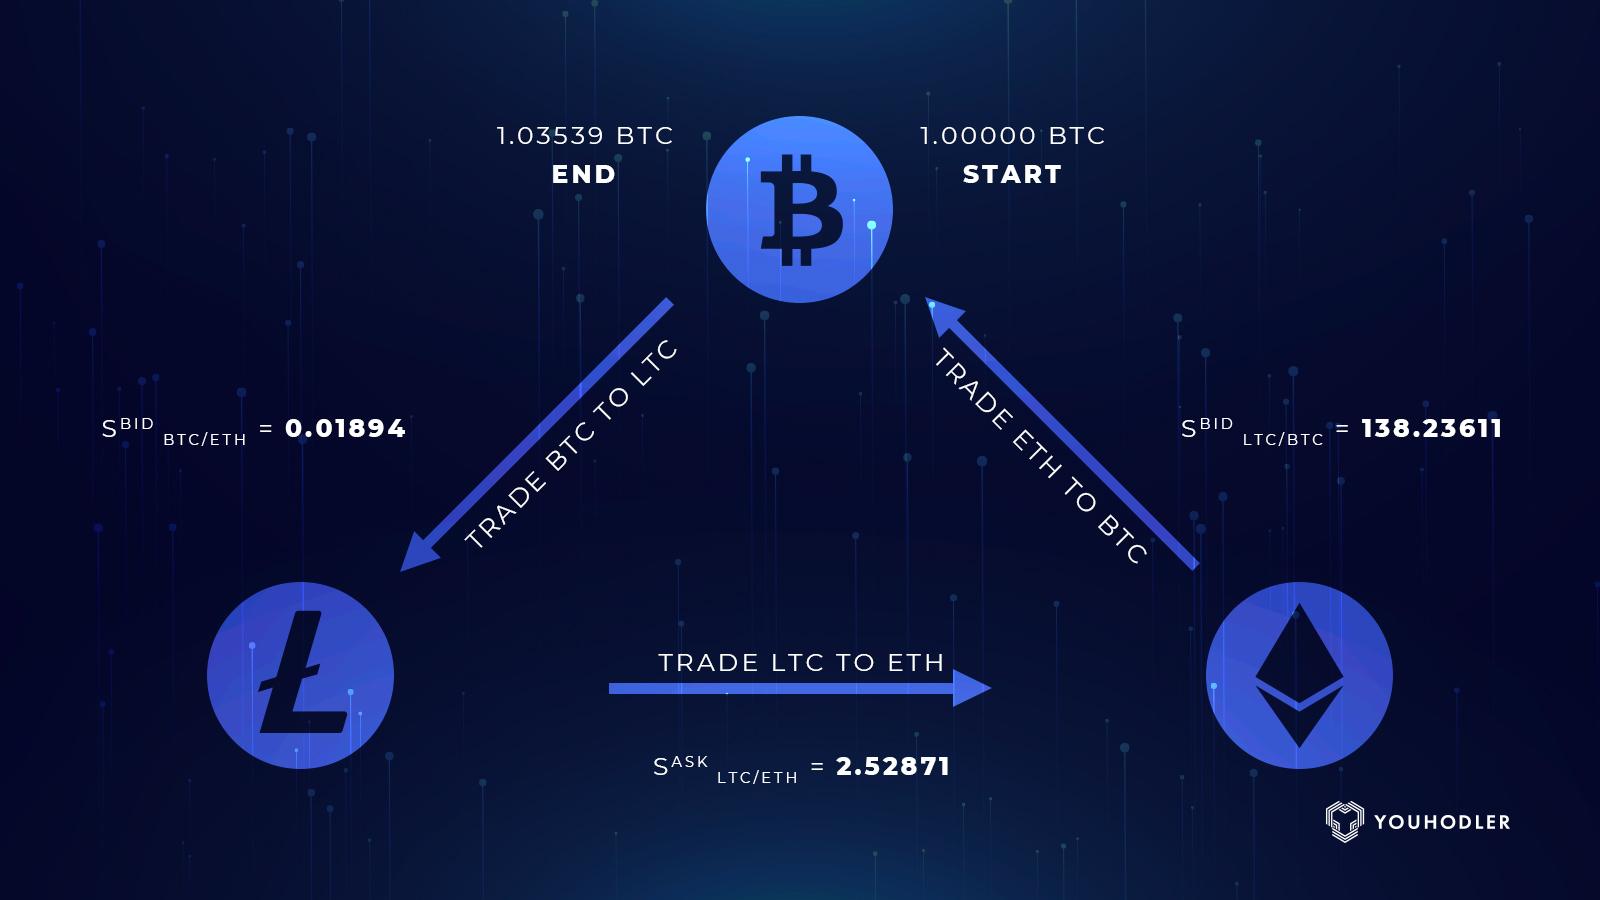 Cryptocurrency triangular arbitrage examples radley alphabetting